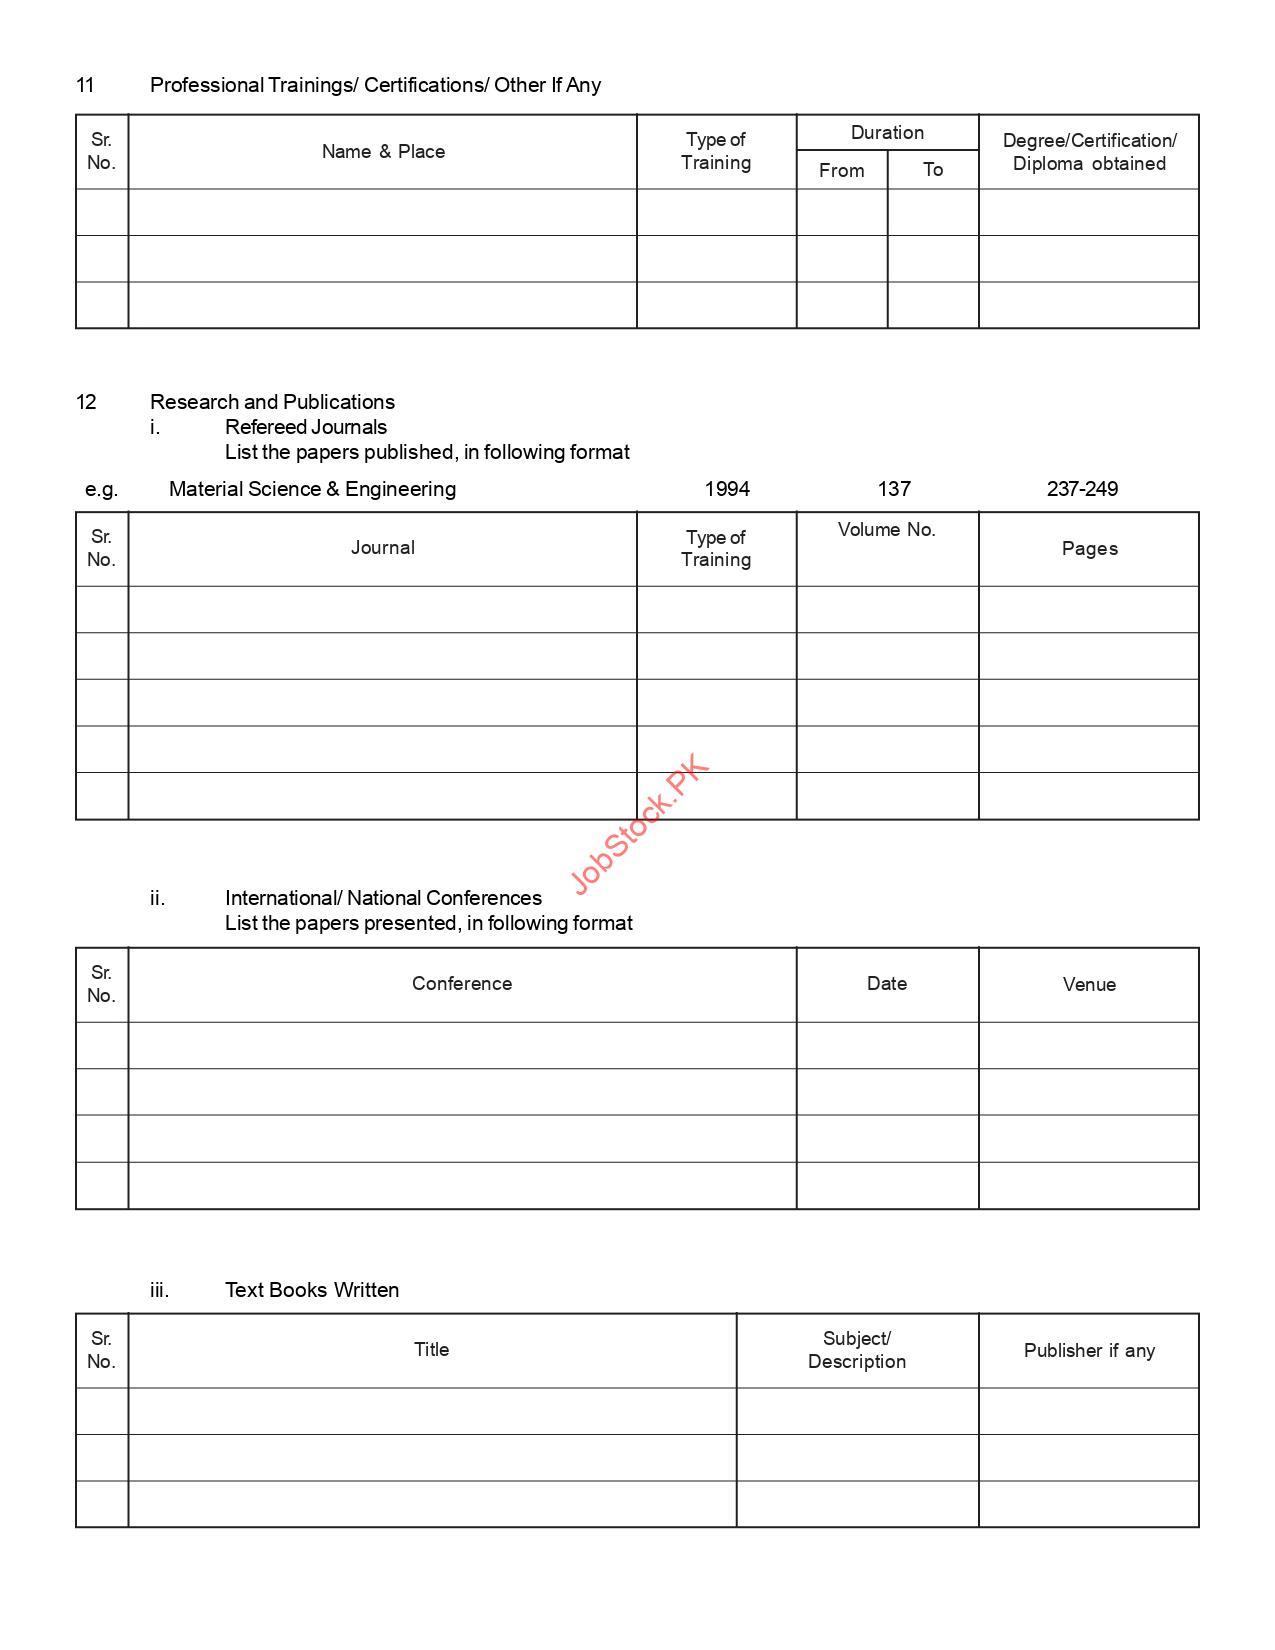 Bzu Jobs Application Form Page 2